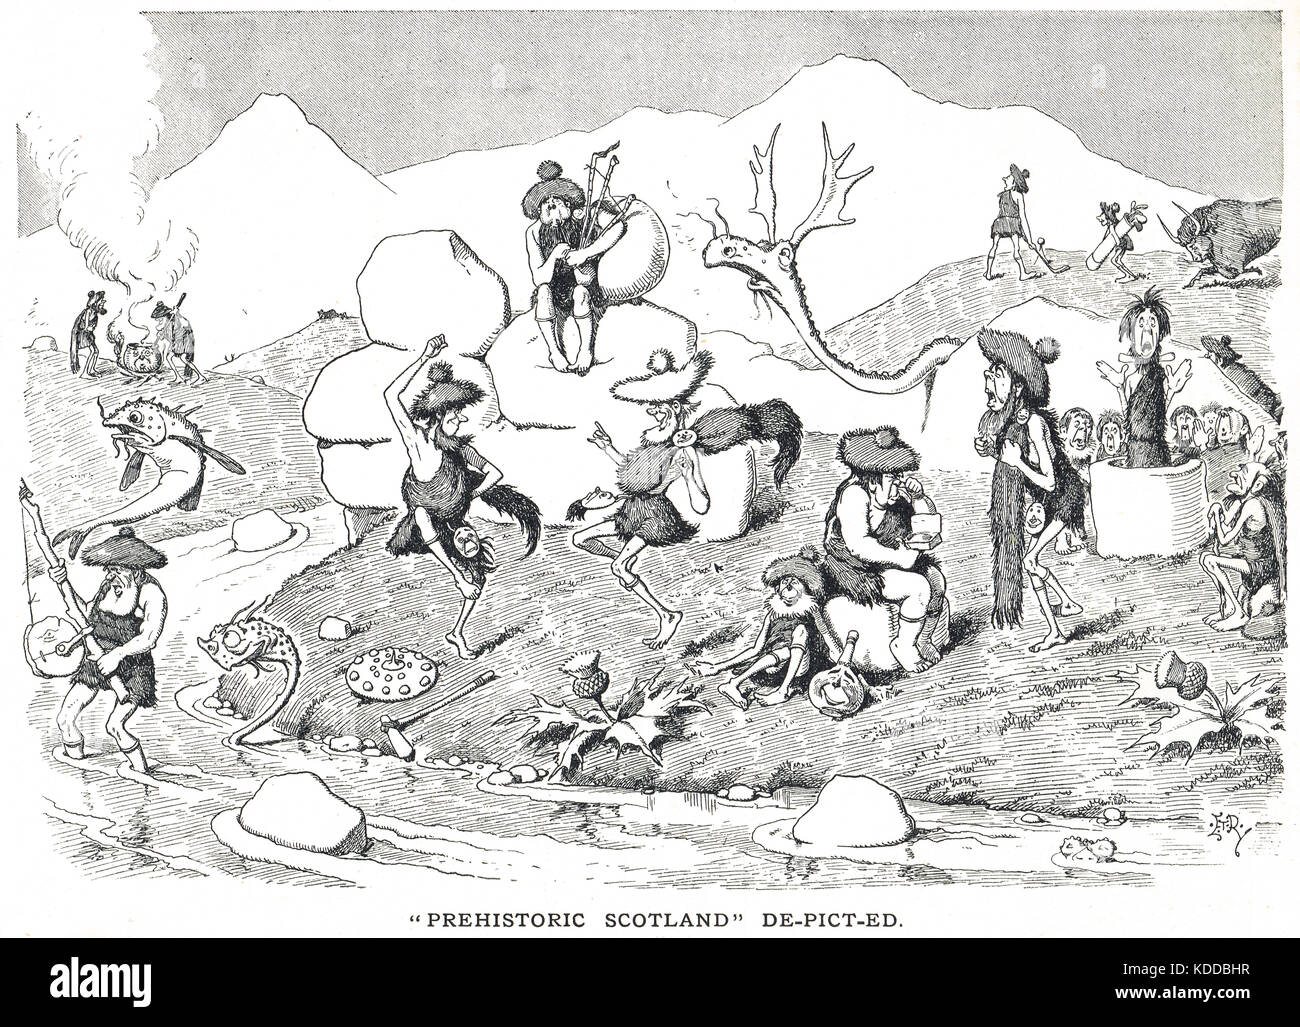 Prehistoric Scotland De-Picted, Punch cartoon of 1900 - Stock Image